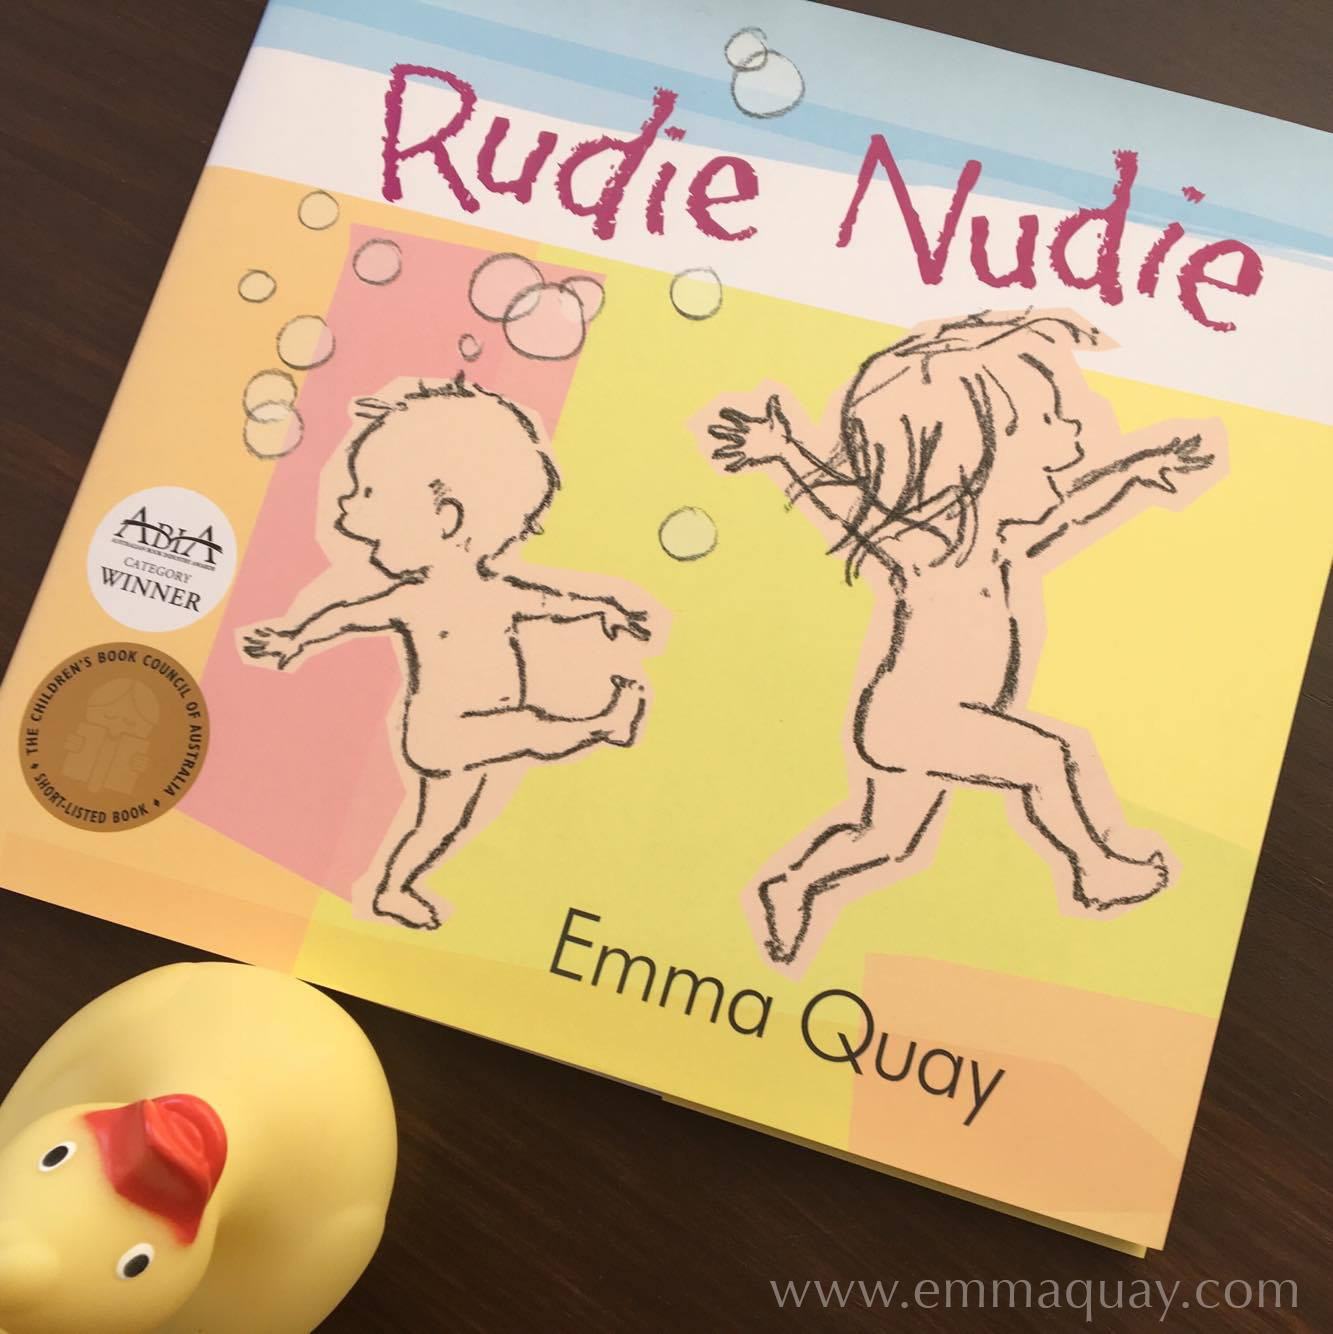 RUDIE NUDIE by Emma Quay (ABC Books) •http://www.emmaquay.com